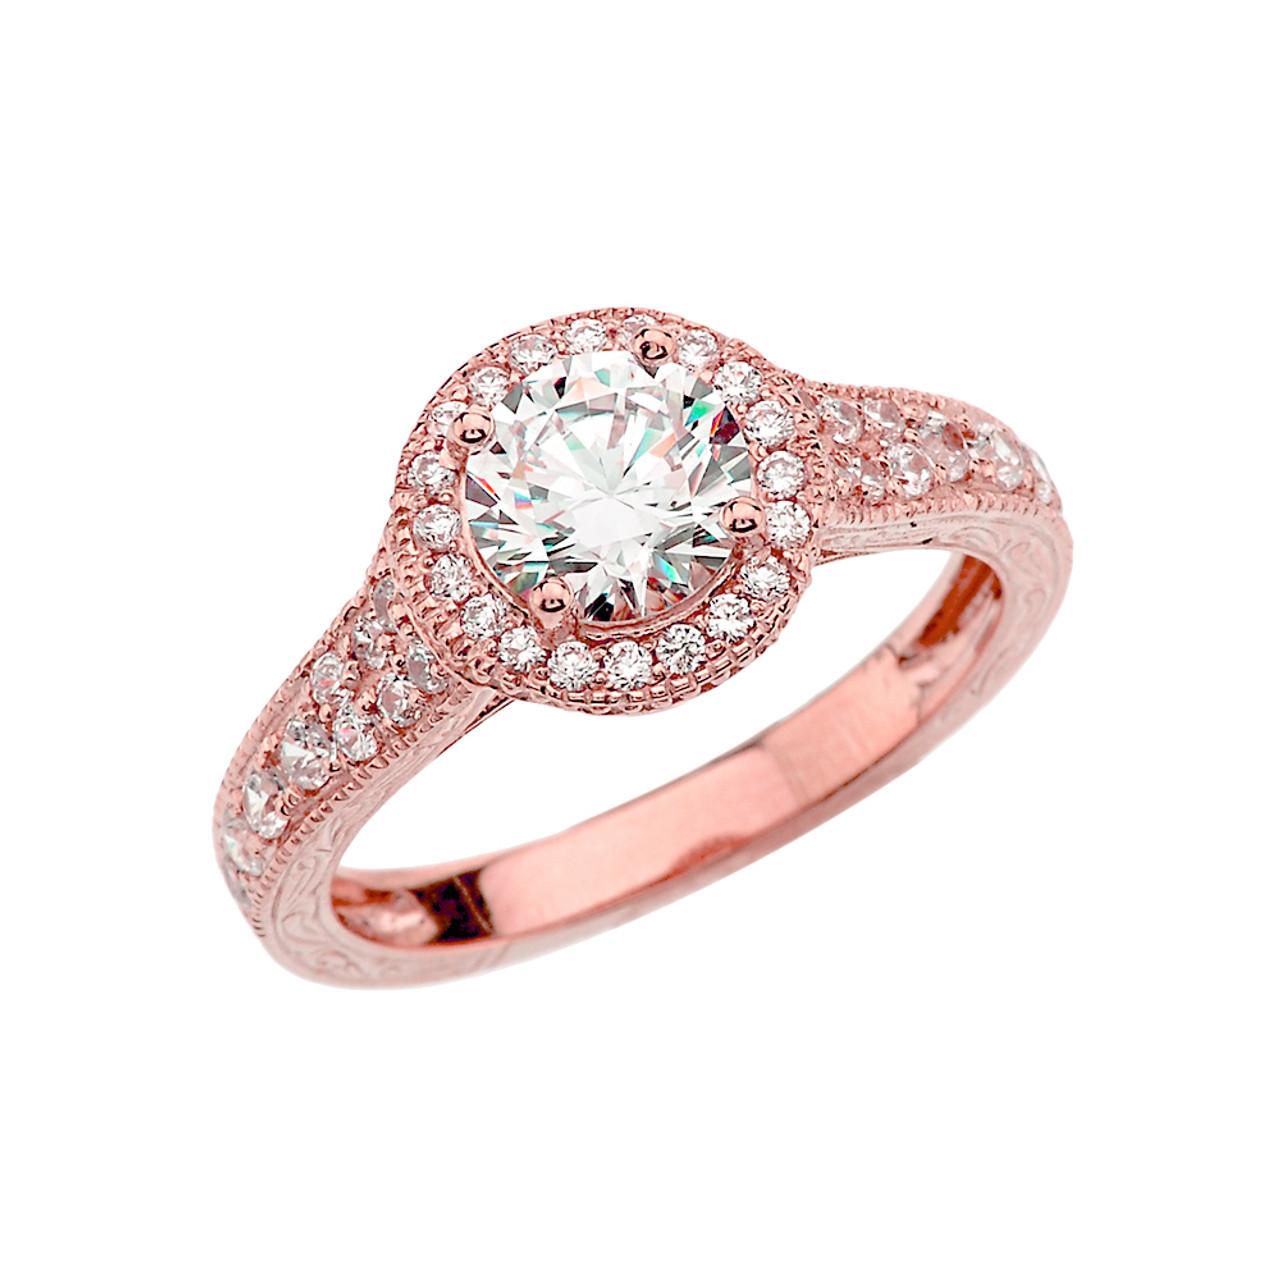 Rose Gold Art Deco Diamond Engagement Ring With 1 ct White Topaz Center  Stone